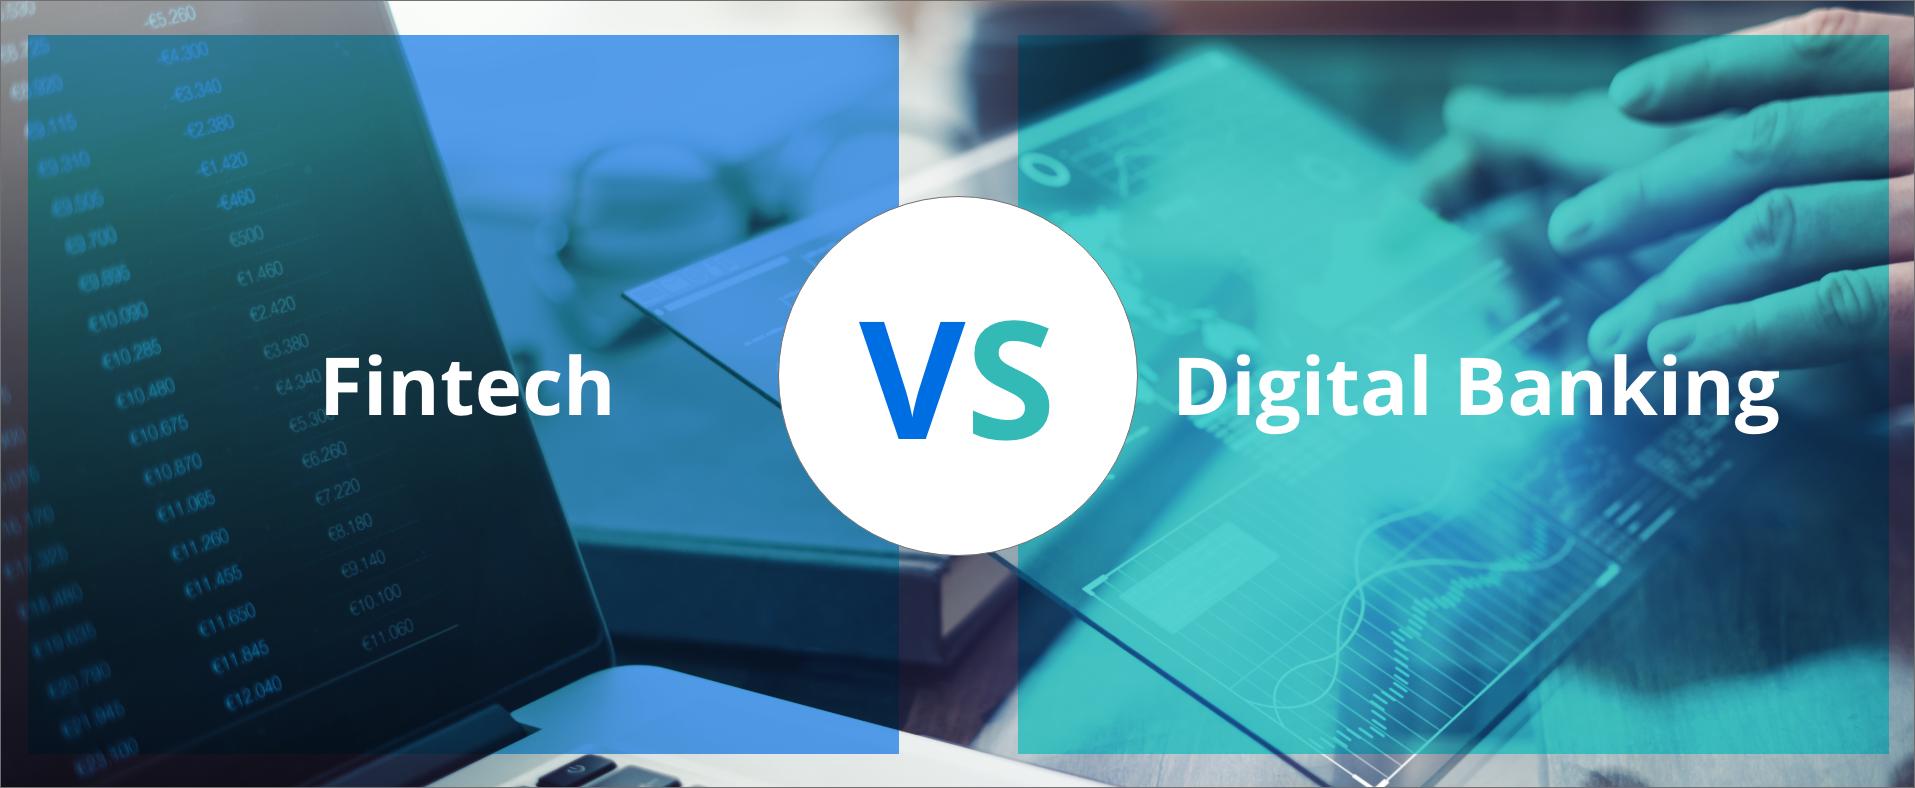 Fintech vs digital banking